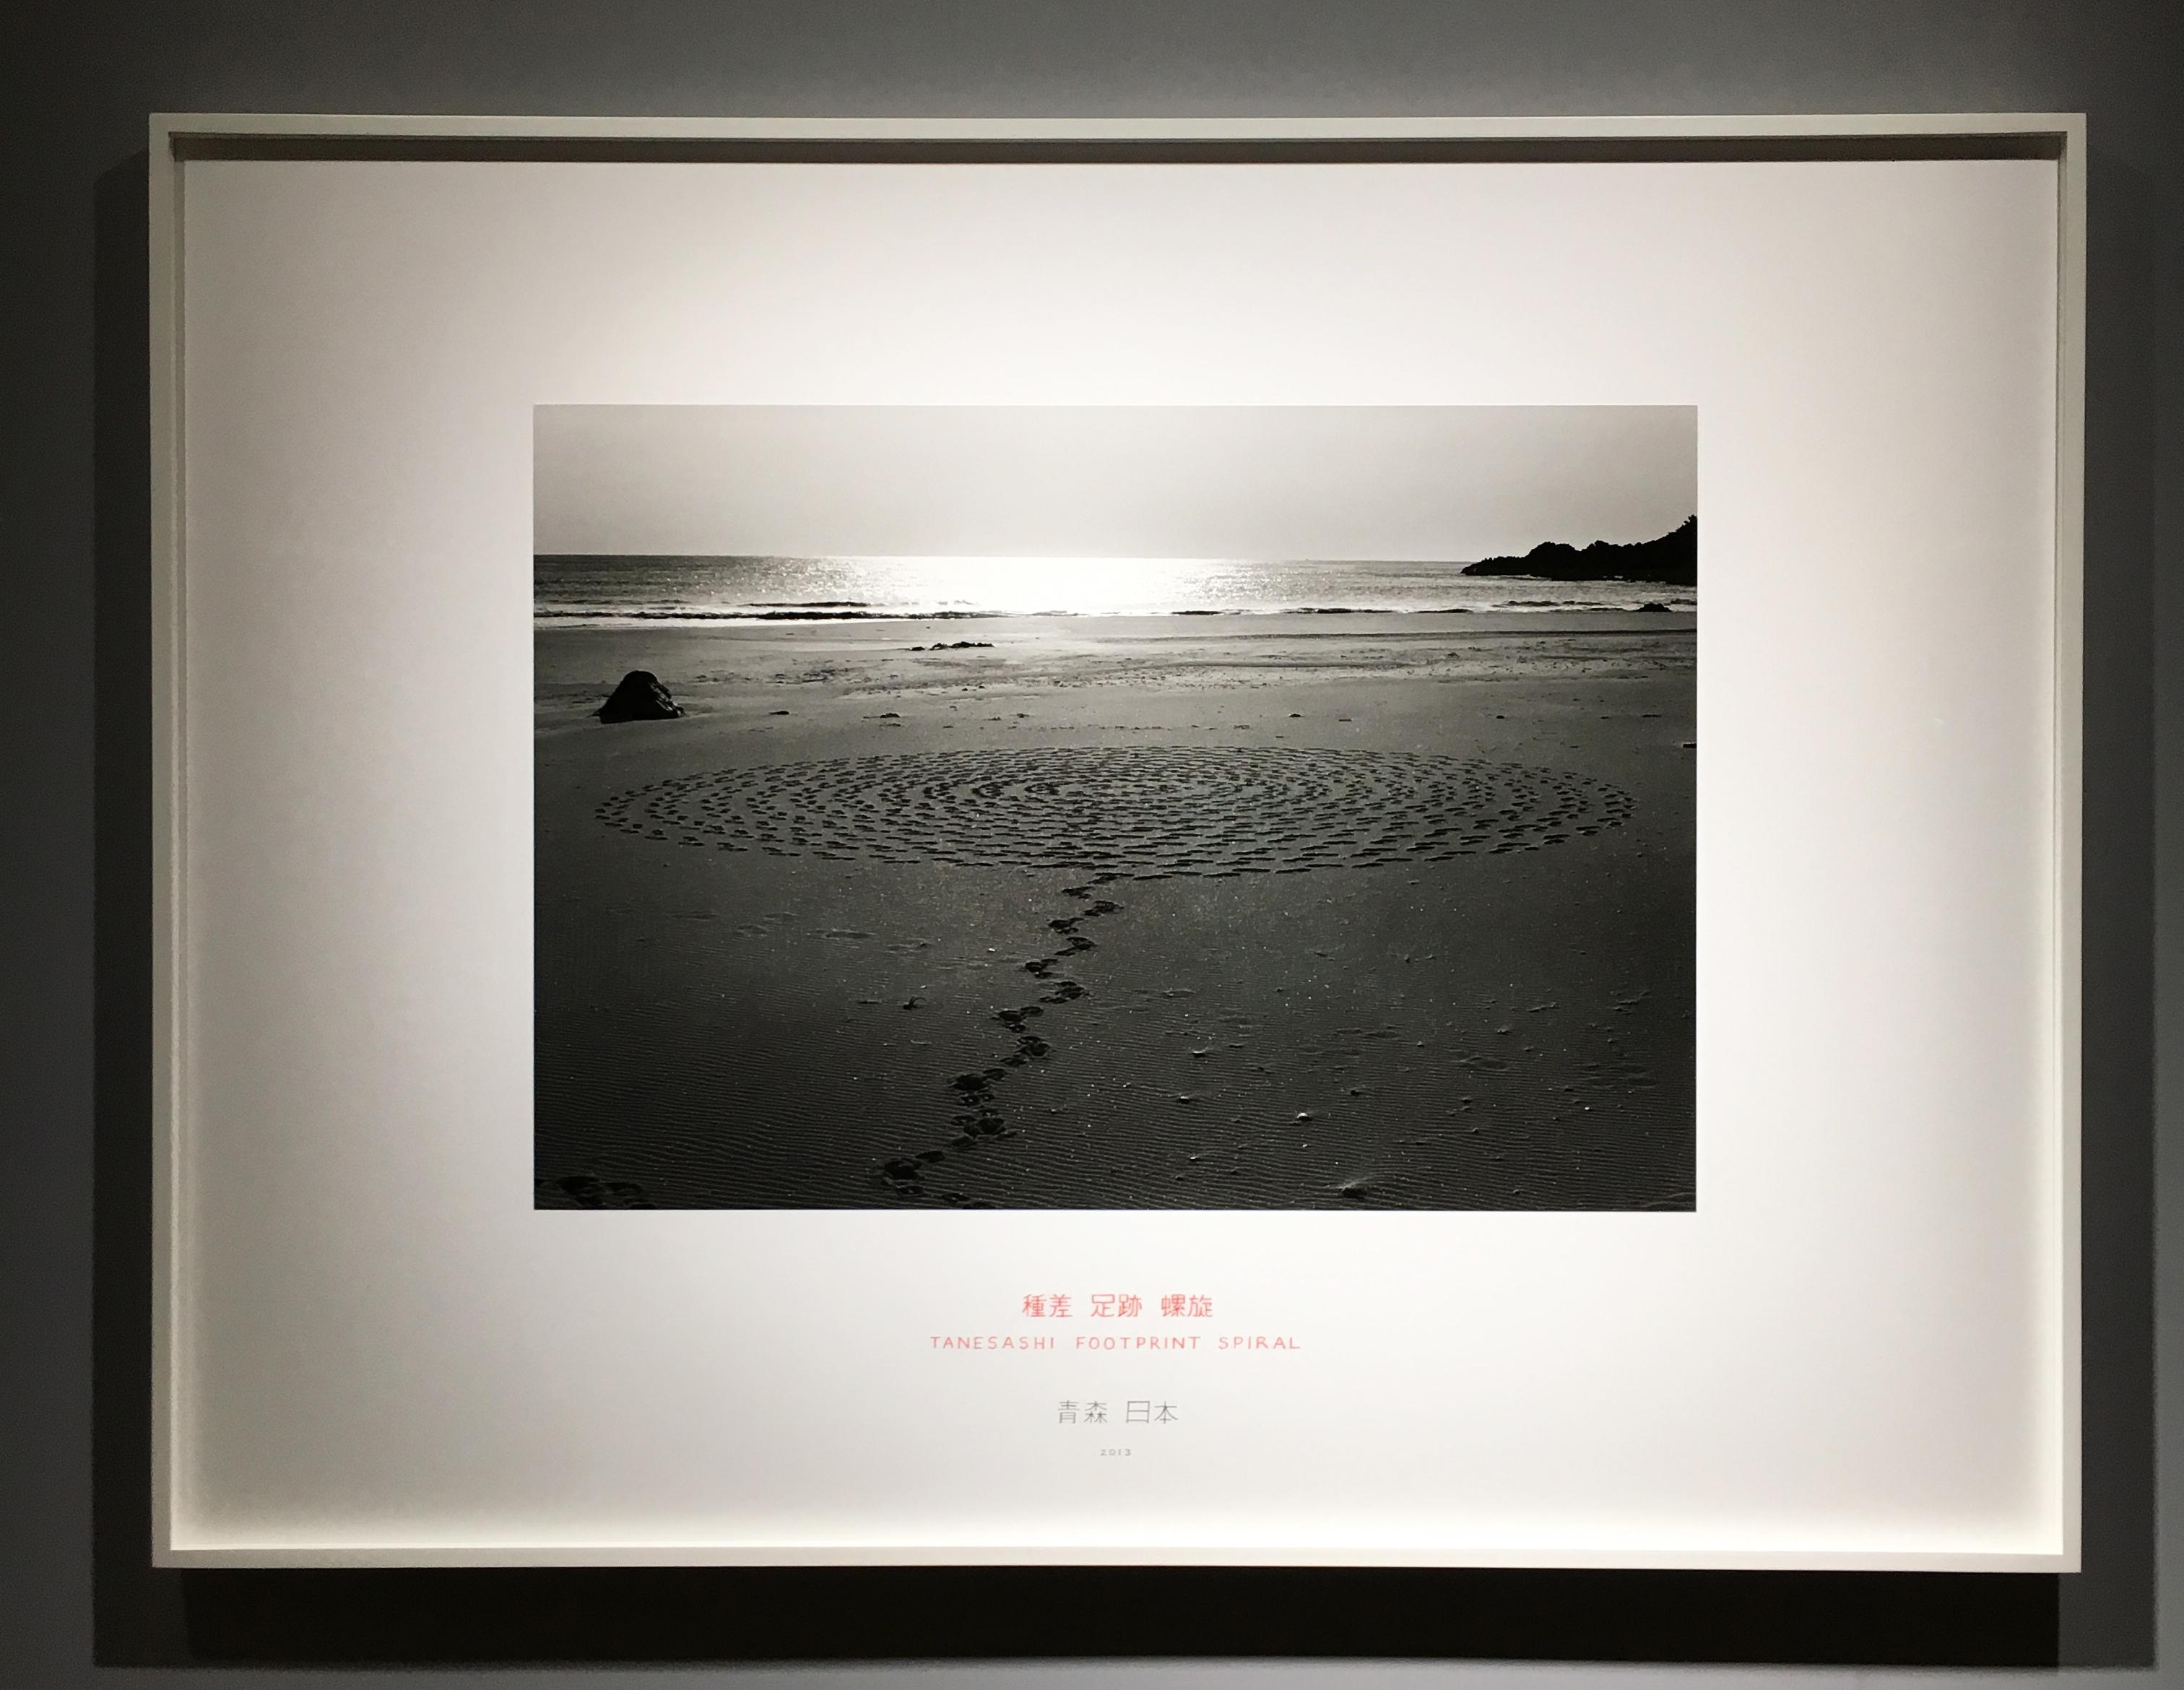 Richard Long,《徒步於海嘯後岸邊》,84 X111.5 cm,攝影,2013。